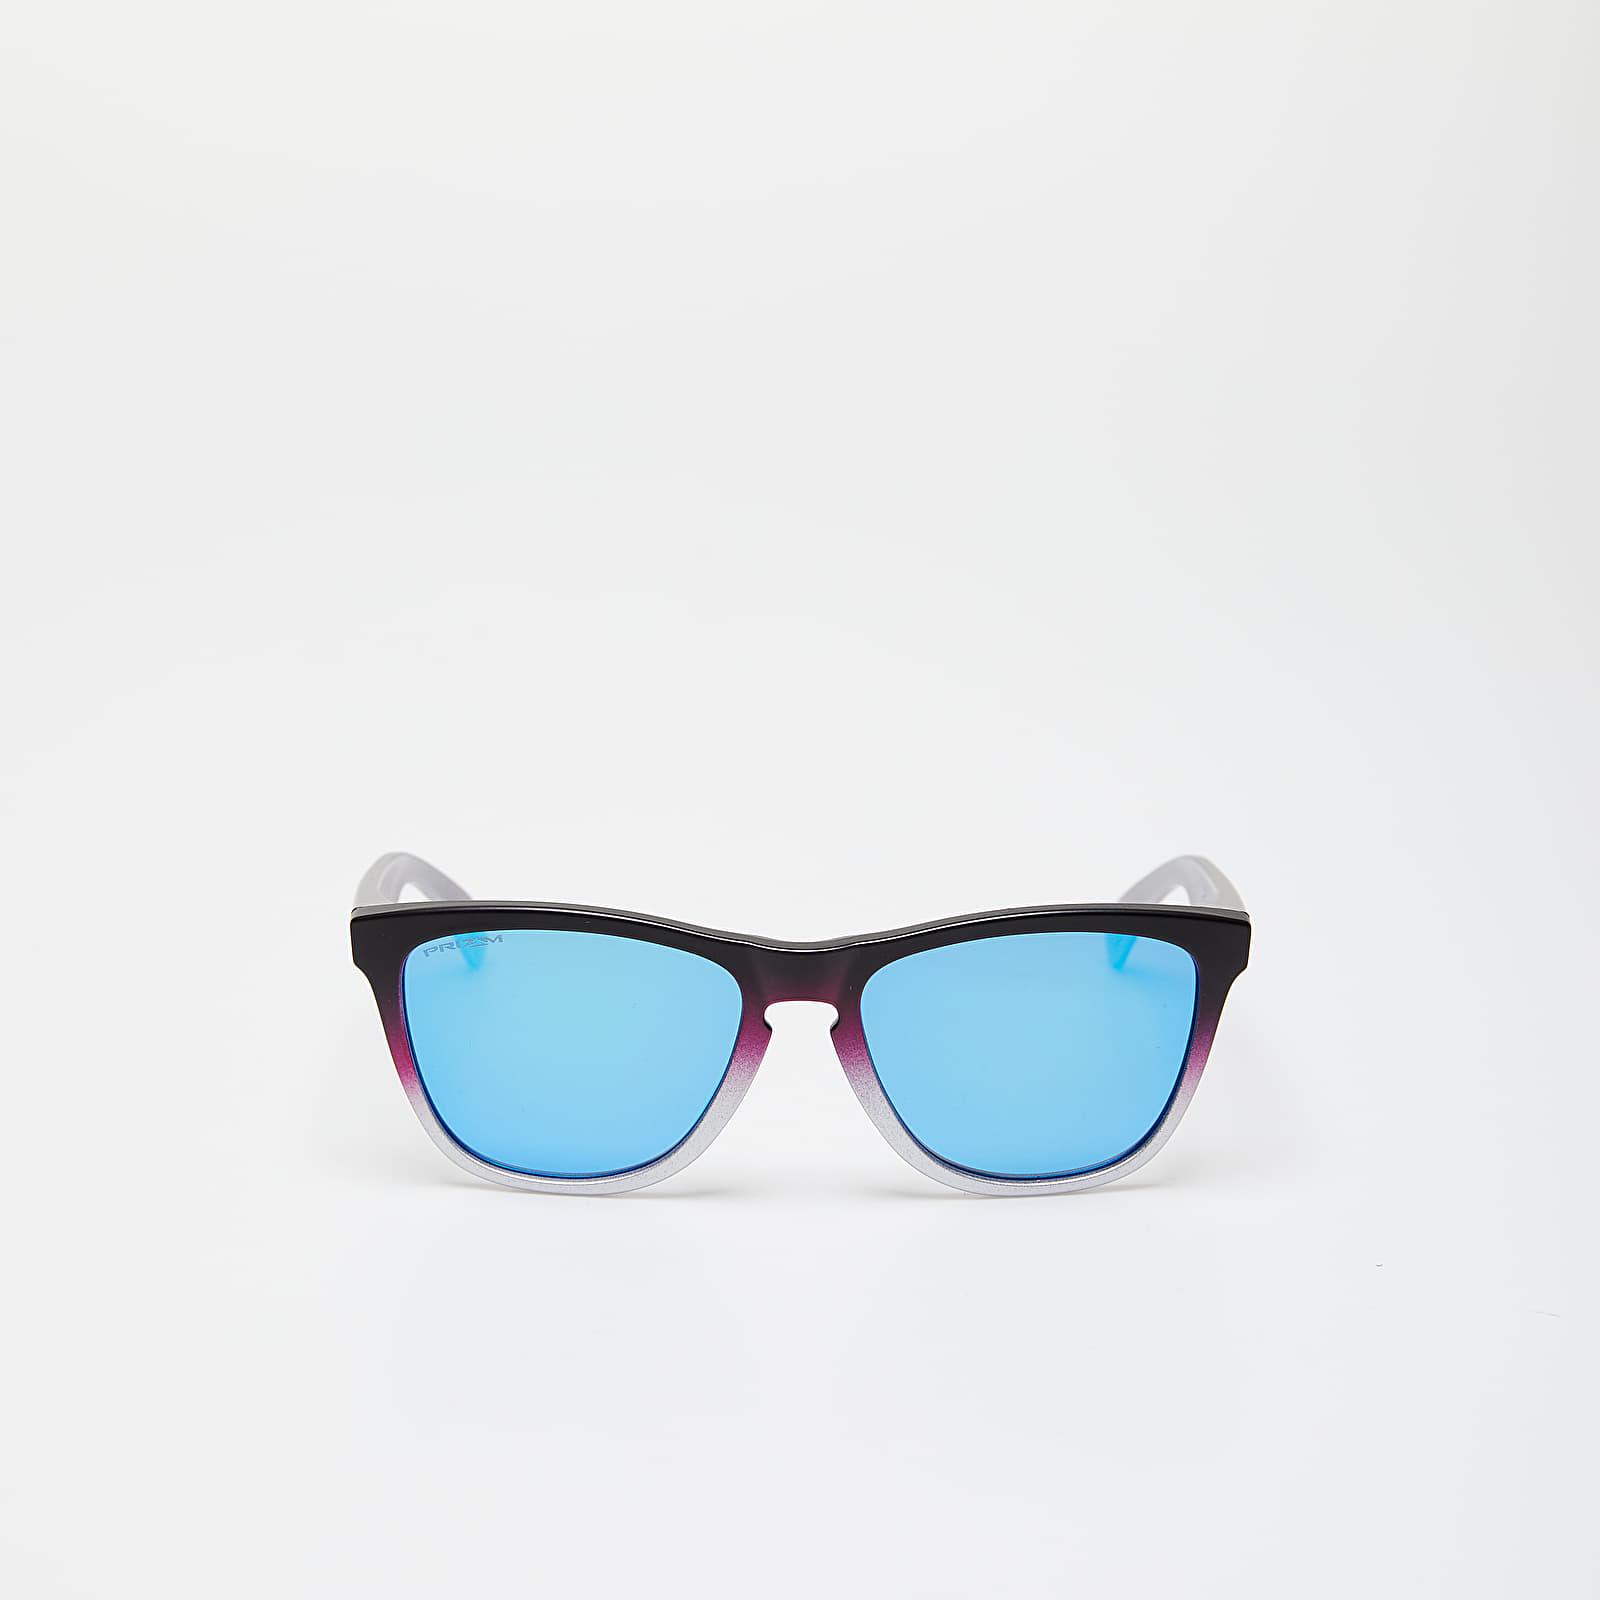 Sunčane naočale Oakley Frogskins Lite Splatterfade Sunglasses Black Pink/ Prizm Sapphire Iridium